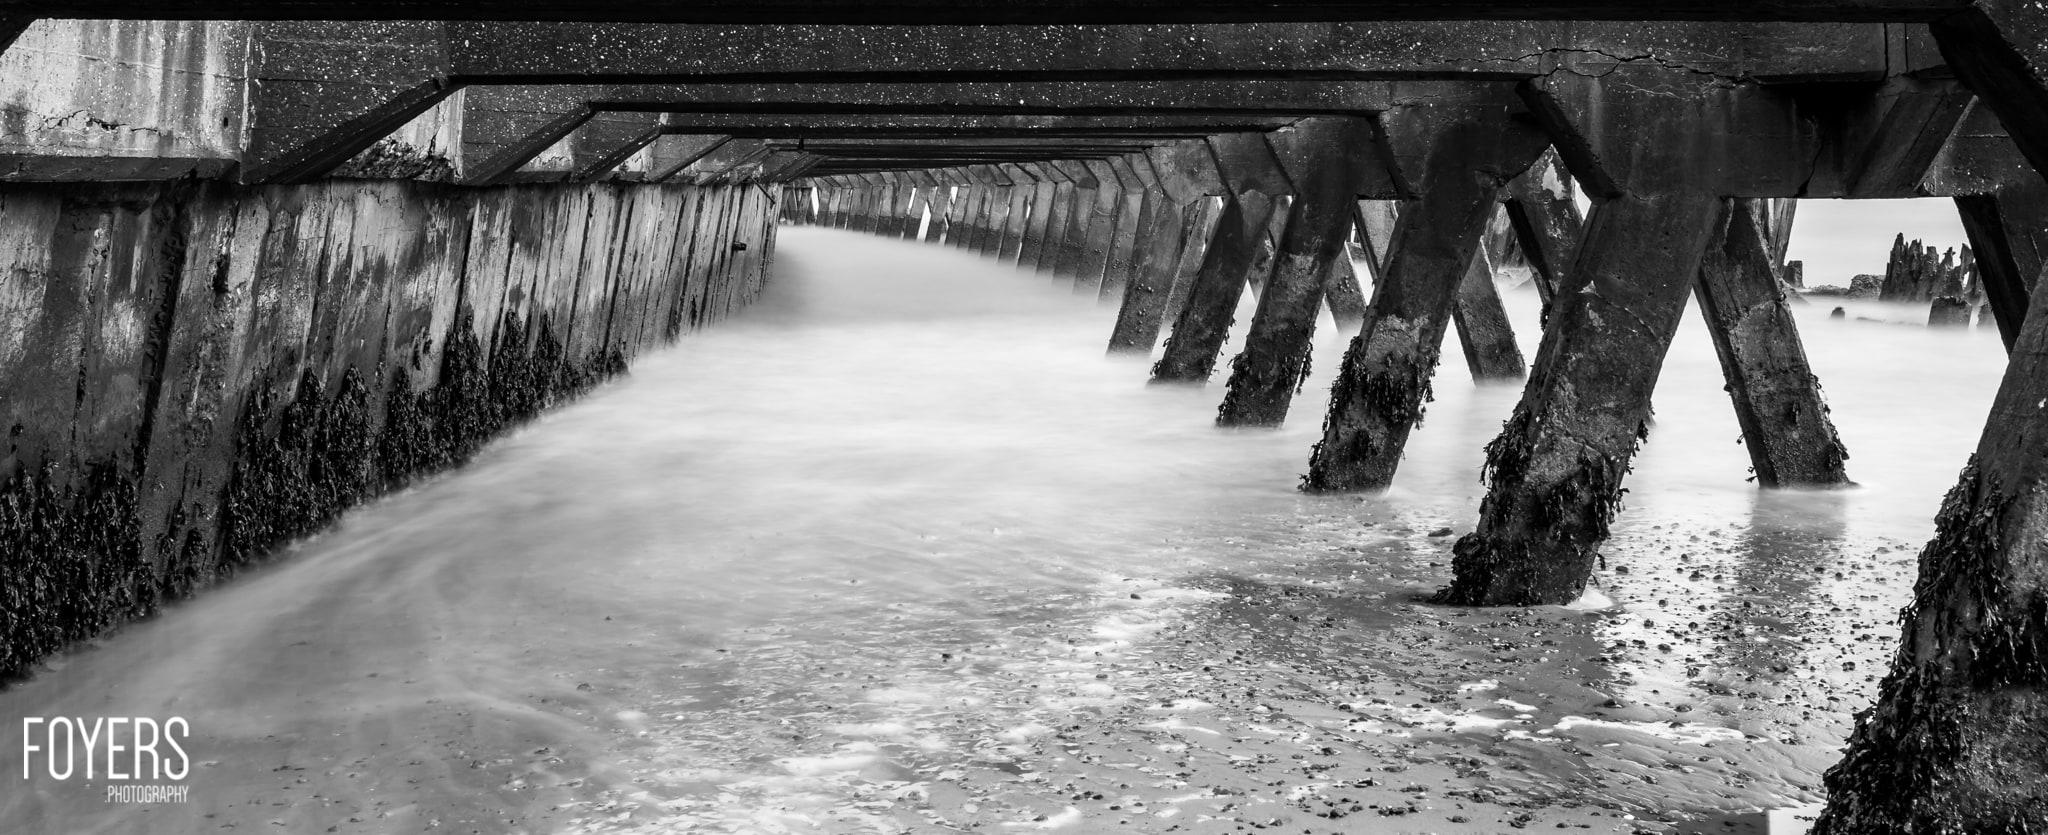 walberswick long exposure suffolk-5461-Copyright-Robert Foyers